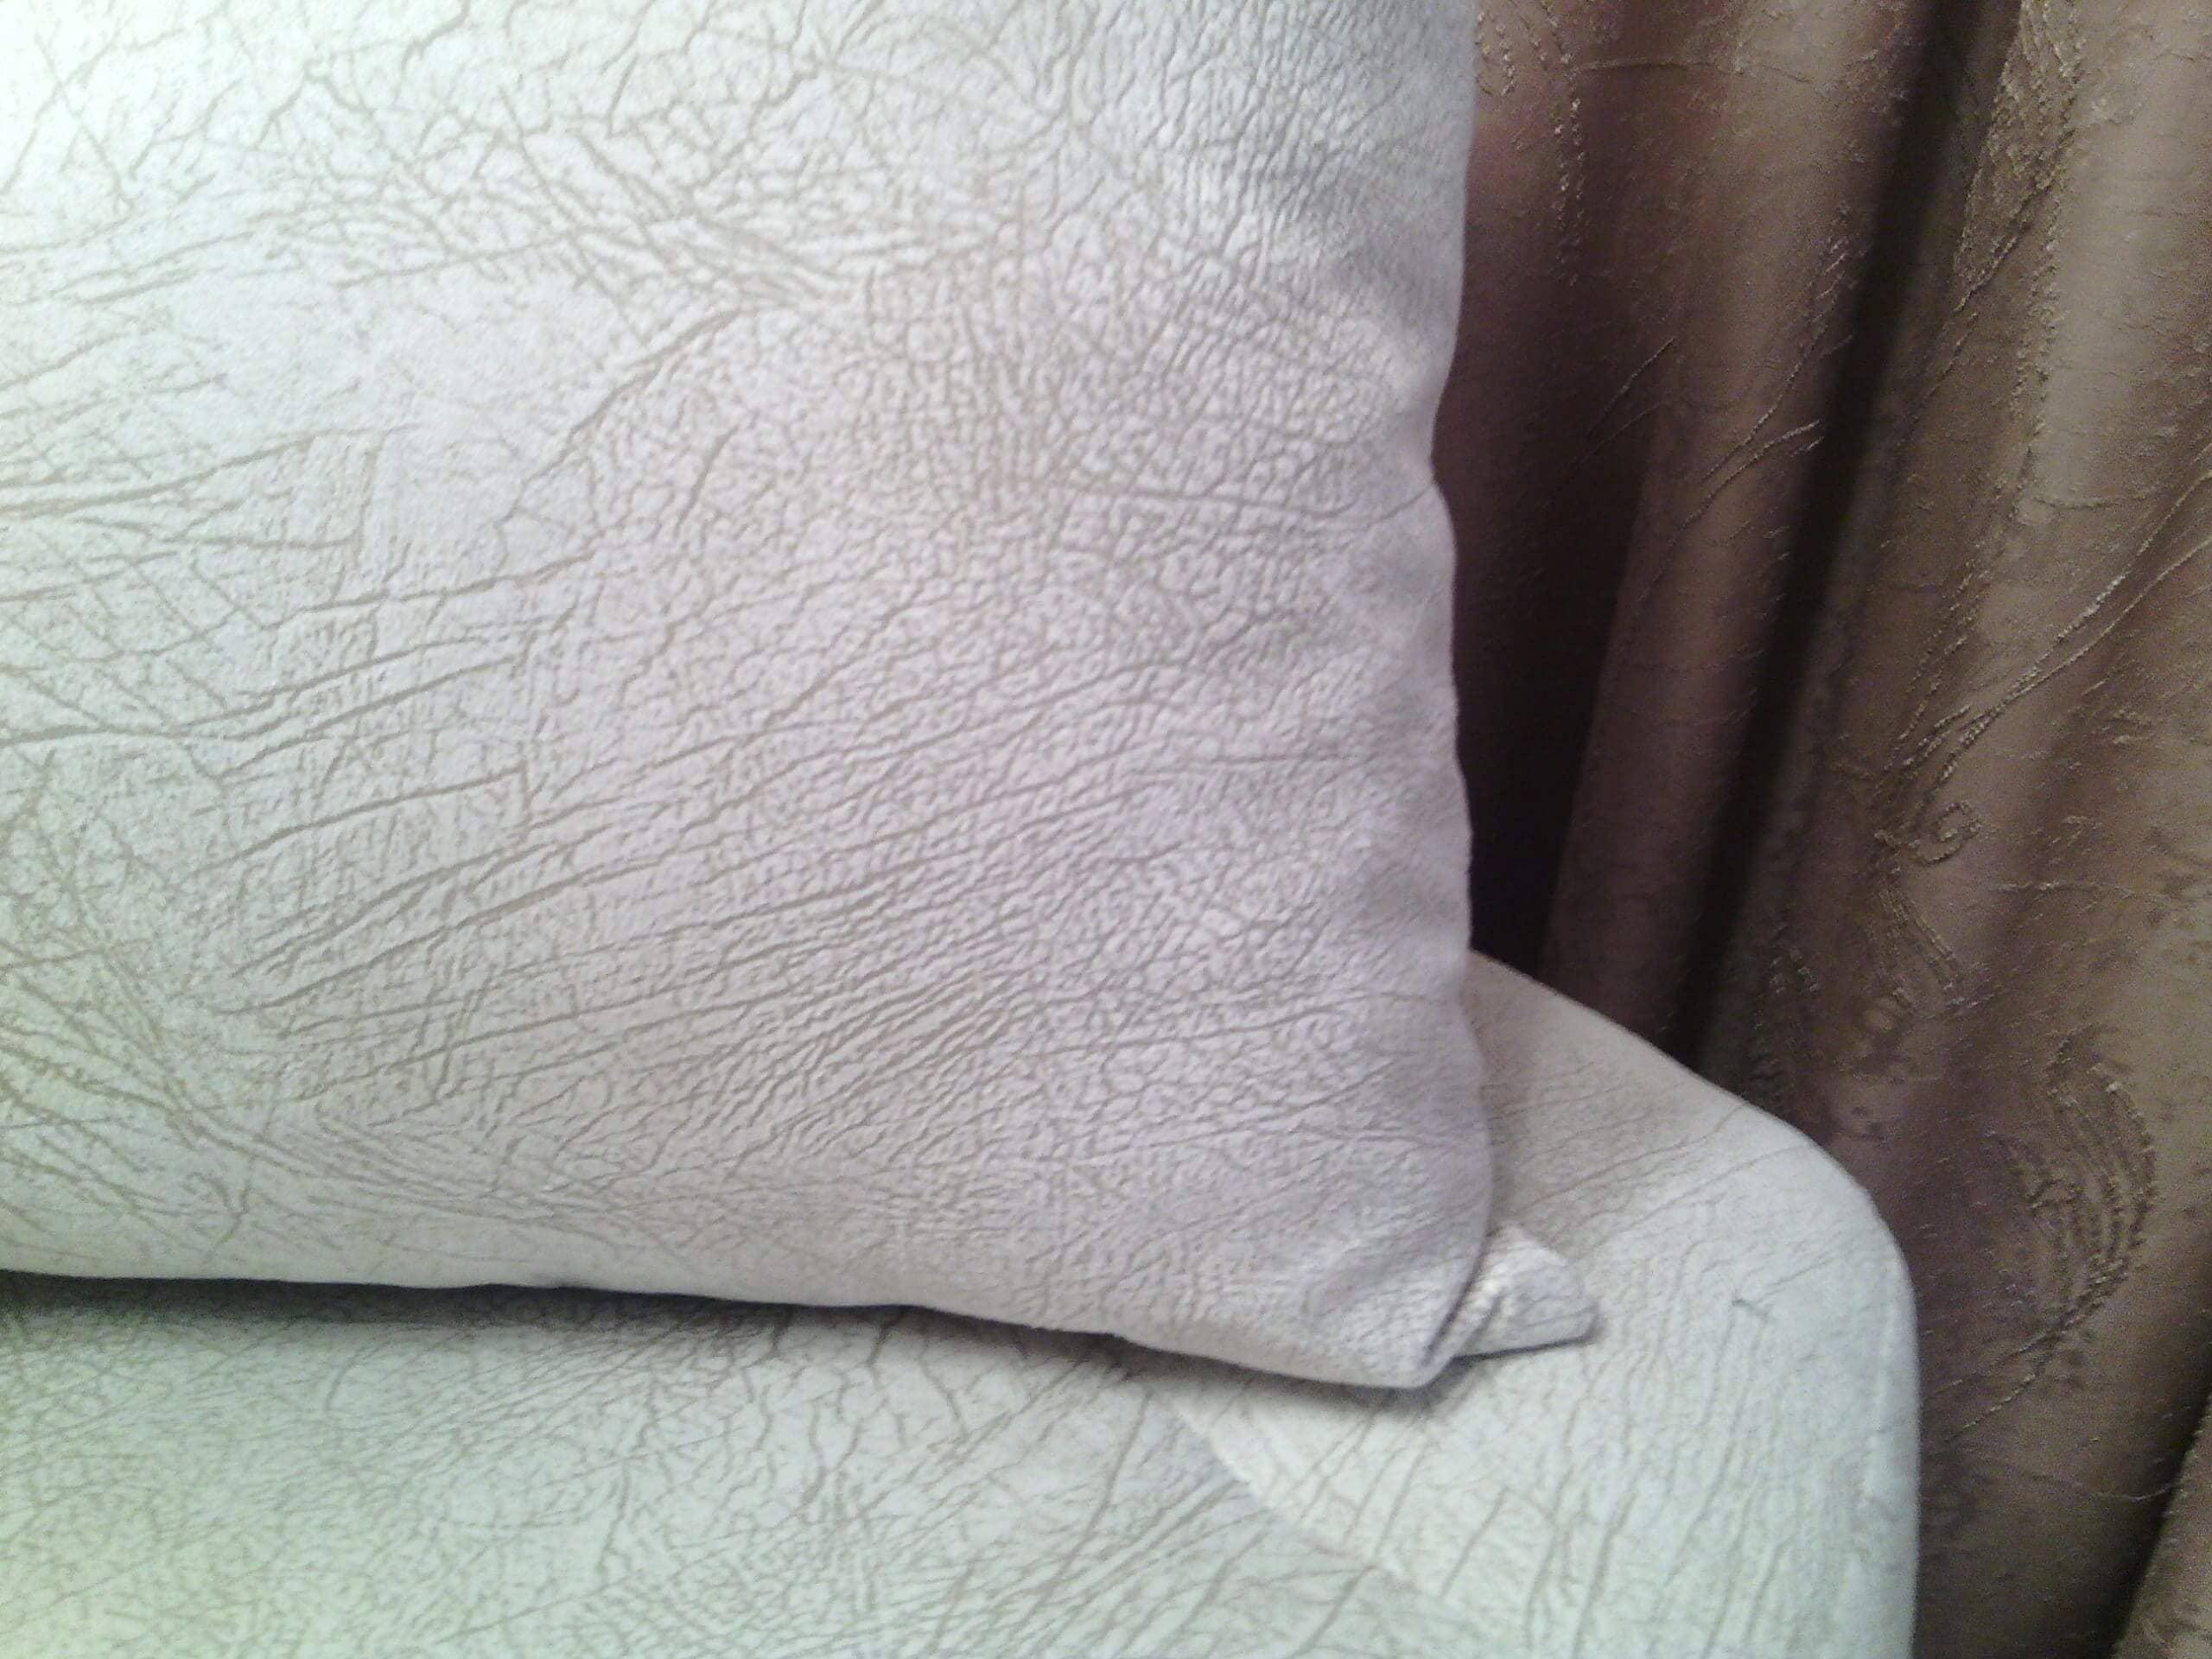 чистка на дому кресла Химки цена